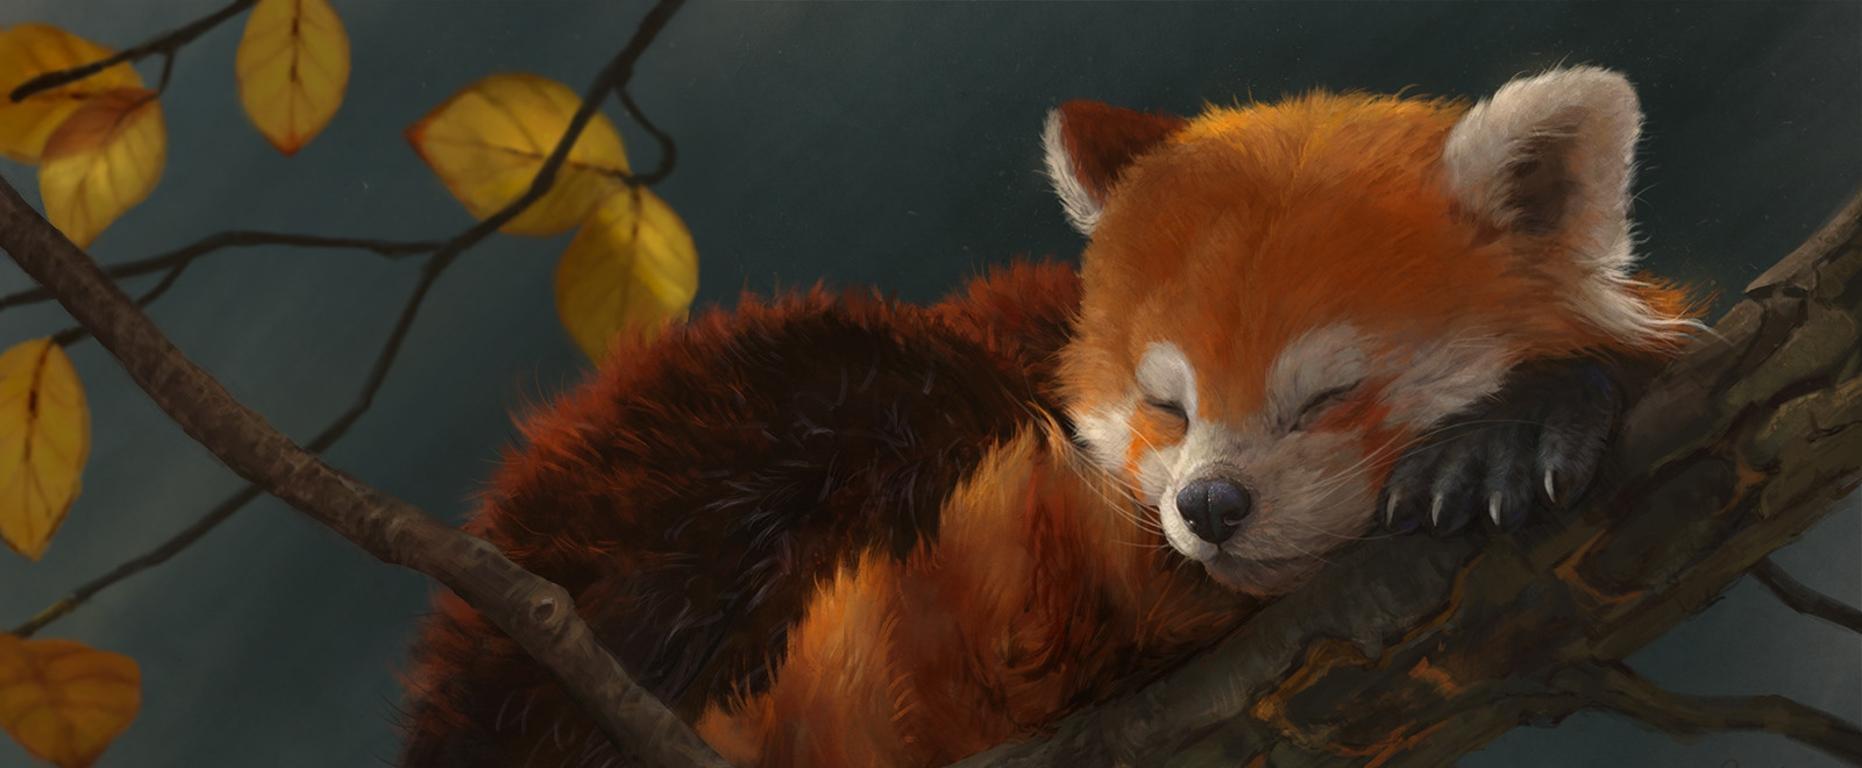 red panda background.jpg